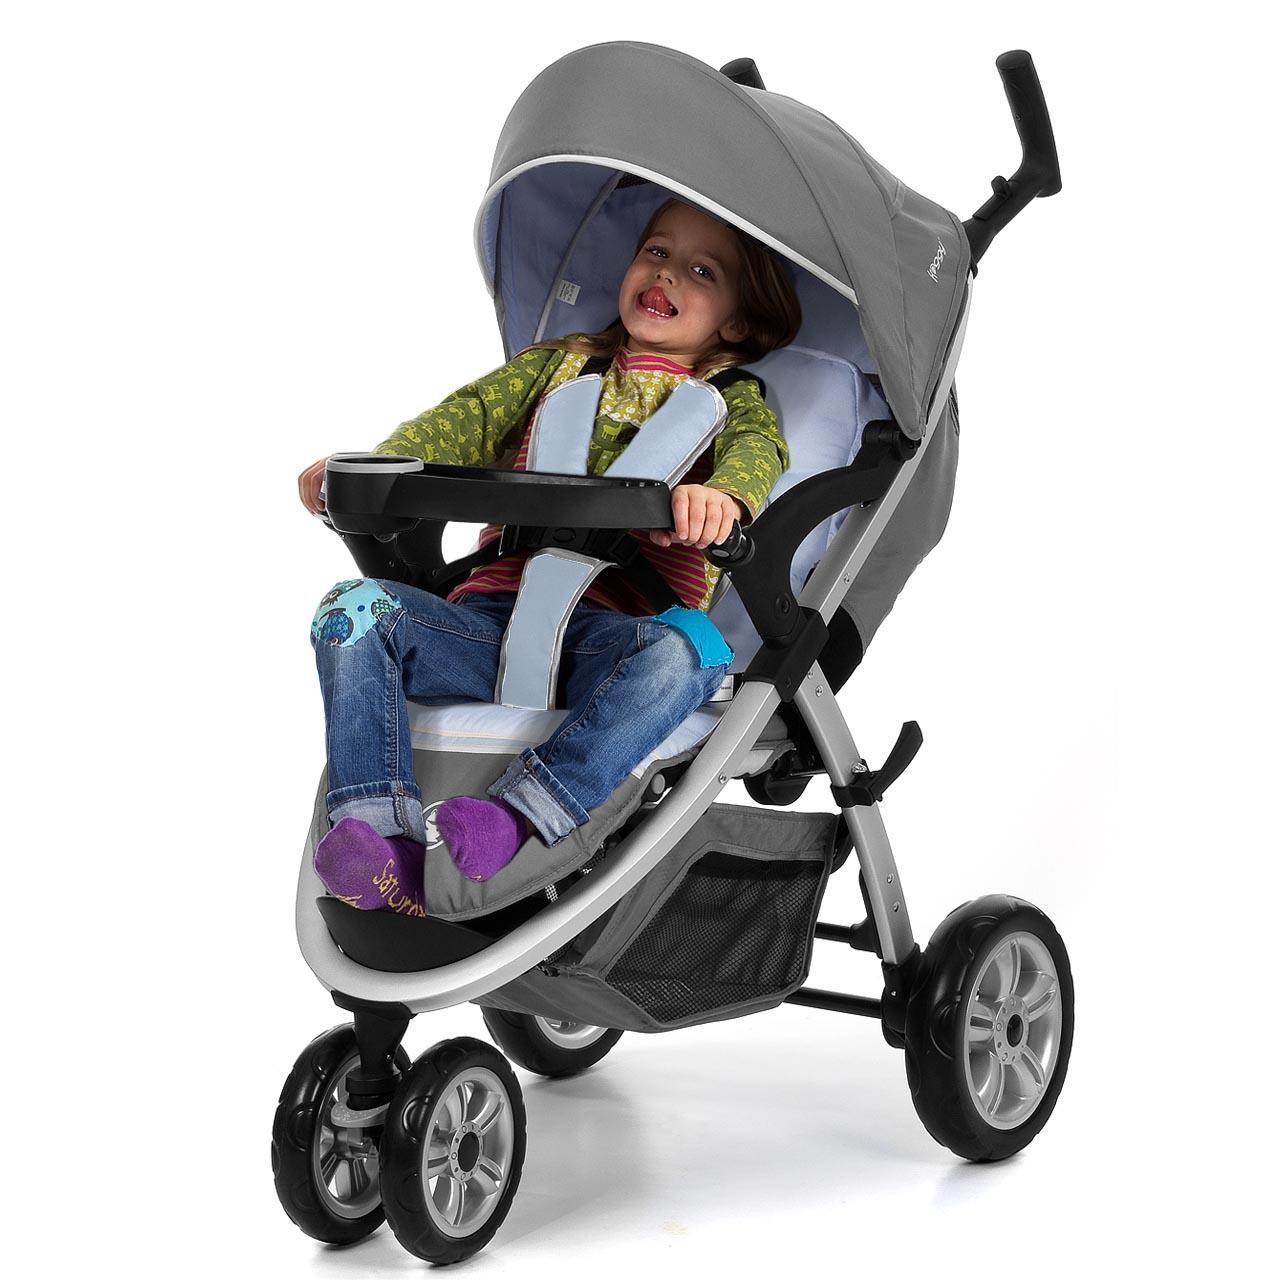 froggy buggy citybug kinderwagen baby sportwagen. Black Bedroom Furniture Sets. Home Design Ideas